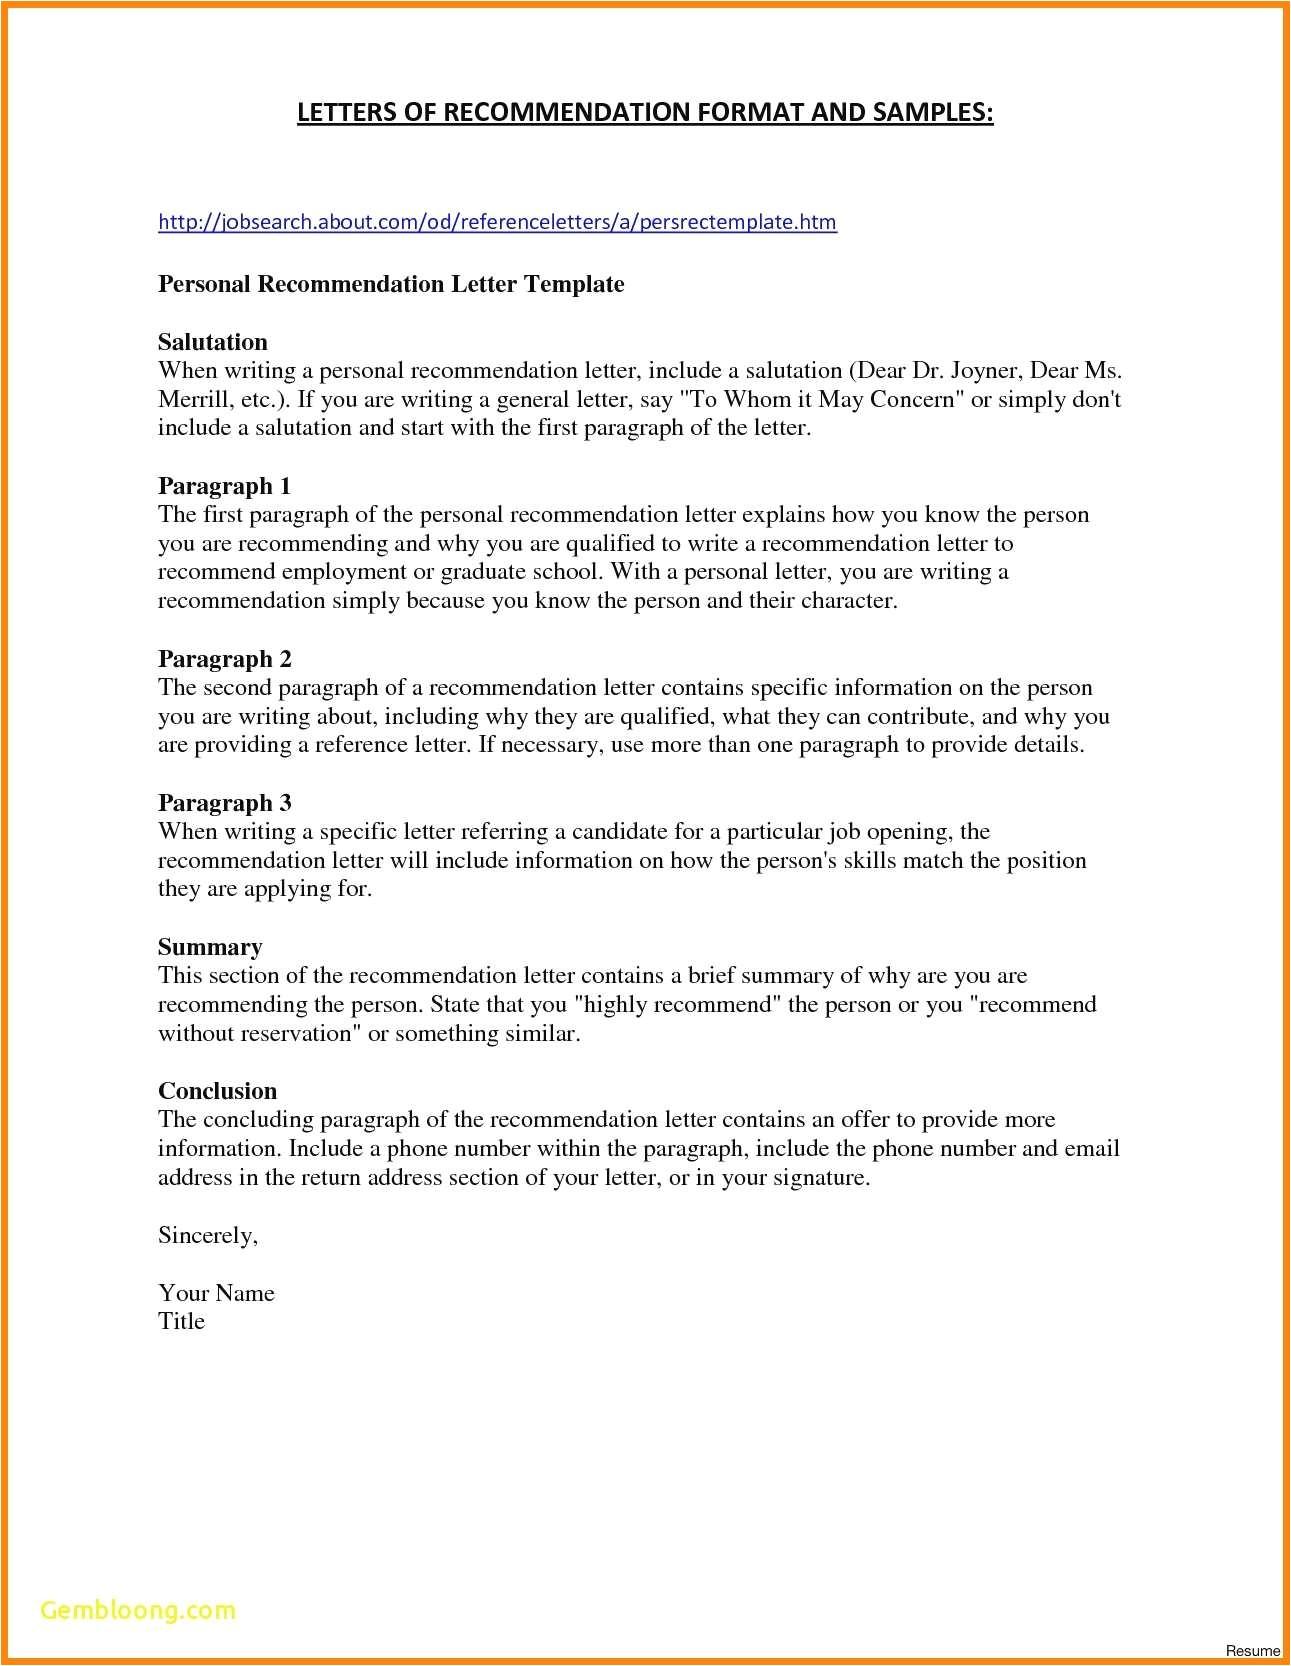 Uline Benches Lularoe Templates Best Of Uline Templates S 3845 Elegant Uline